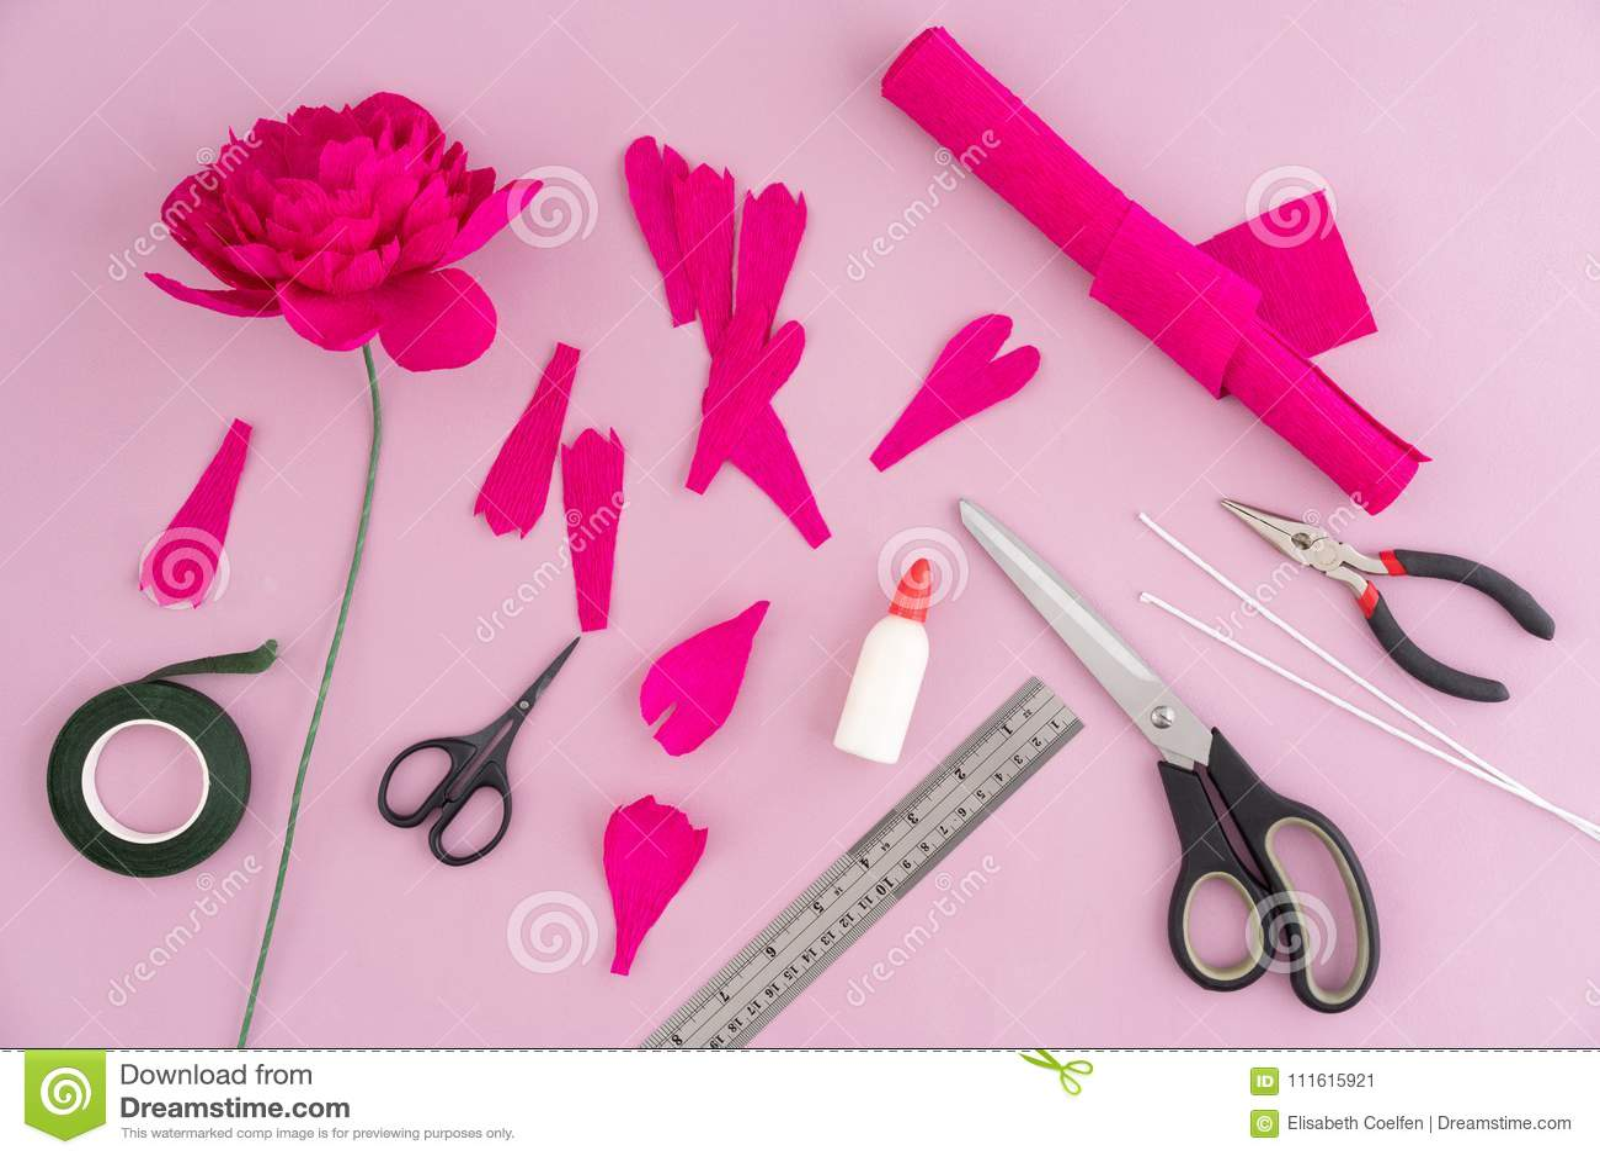 Making Paper Flowers Stock Image Image Of Utensils 111615921